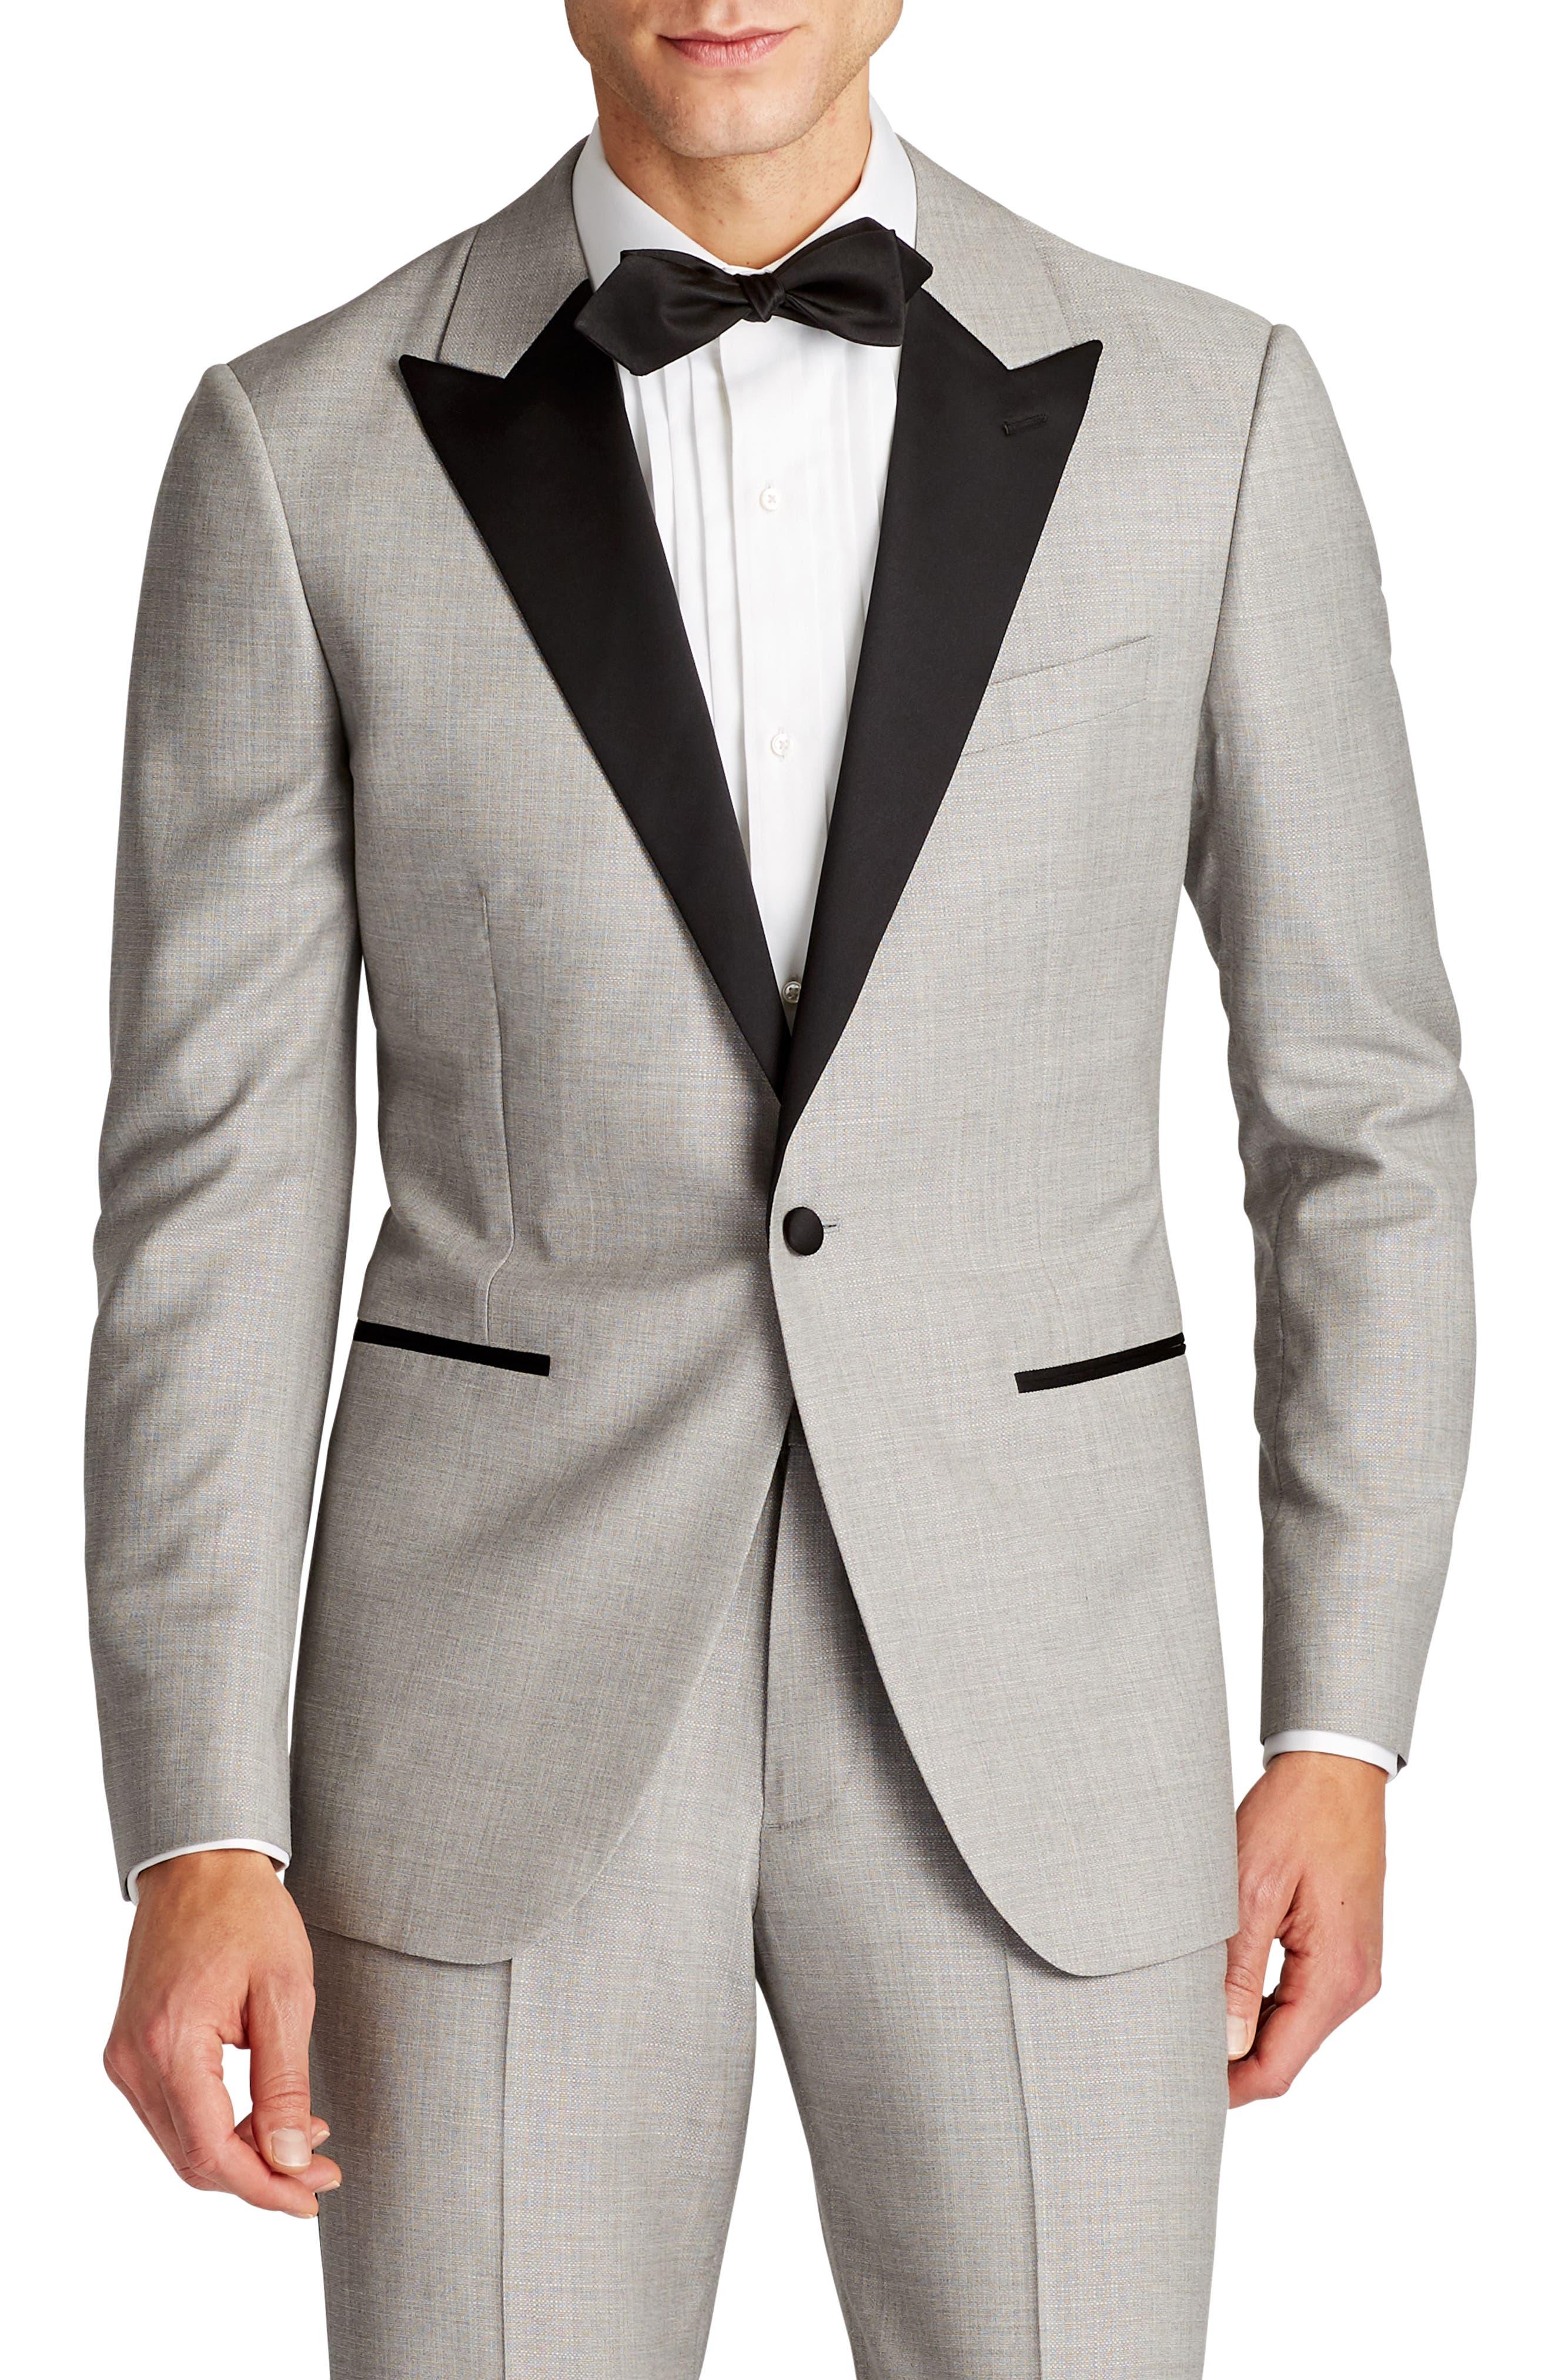 Capstone Slim Fit Wool Dinner Jacket,                             Main thumbnail 1, color,                             Pearl Grey